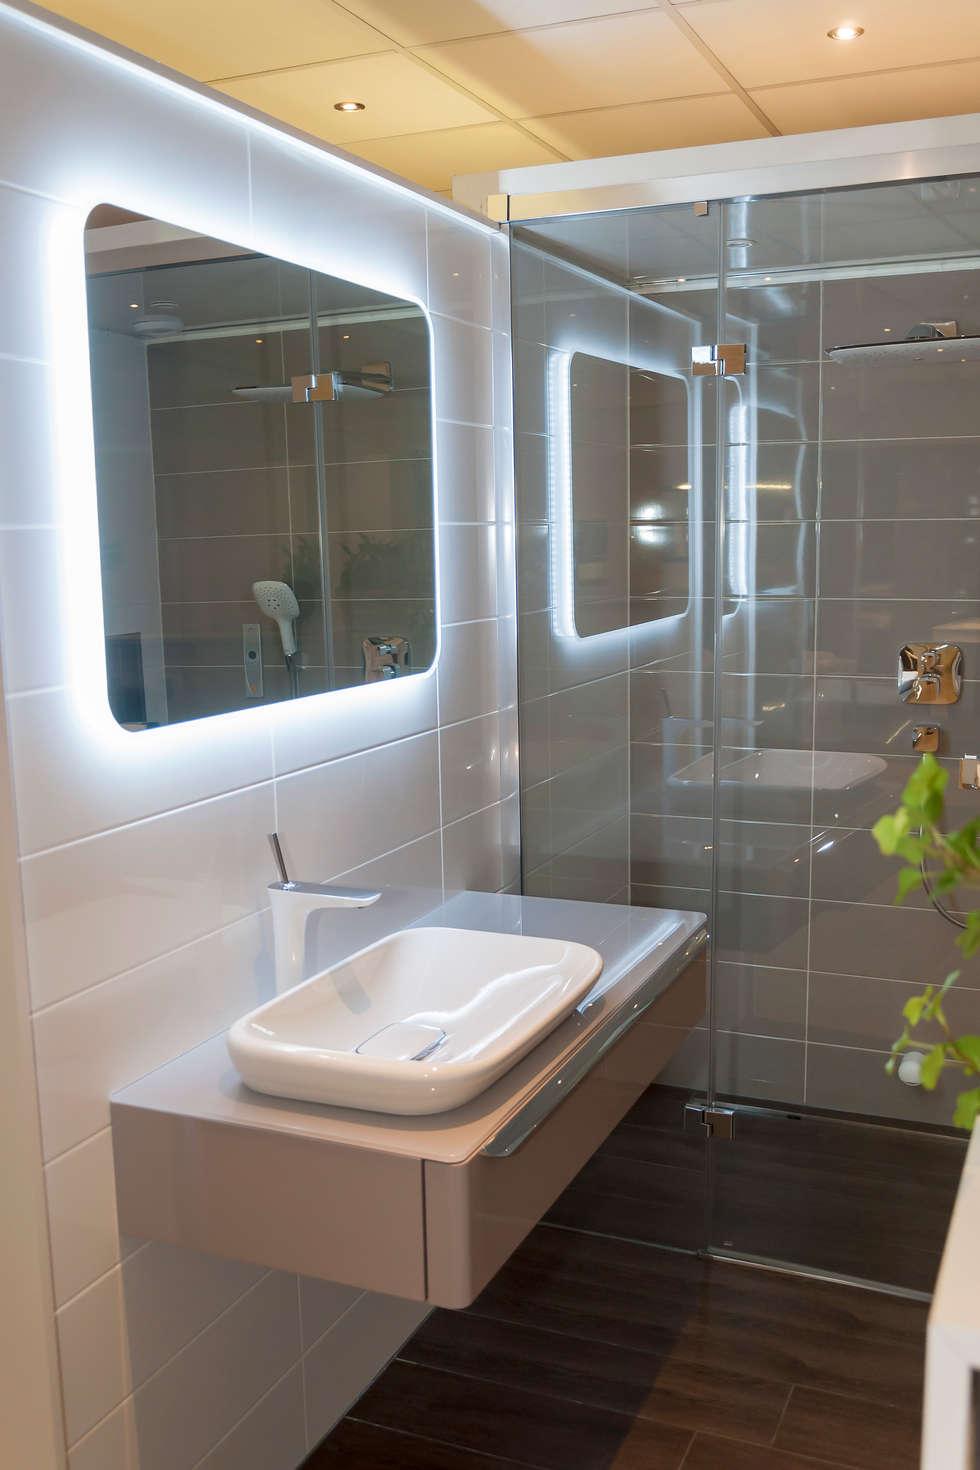 Am badkamers: modern tarz banyo   homify